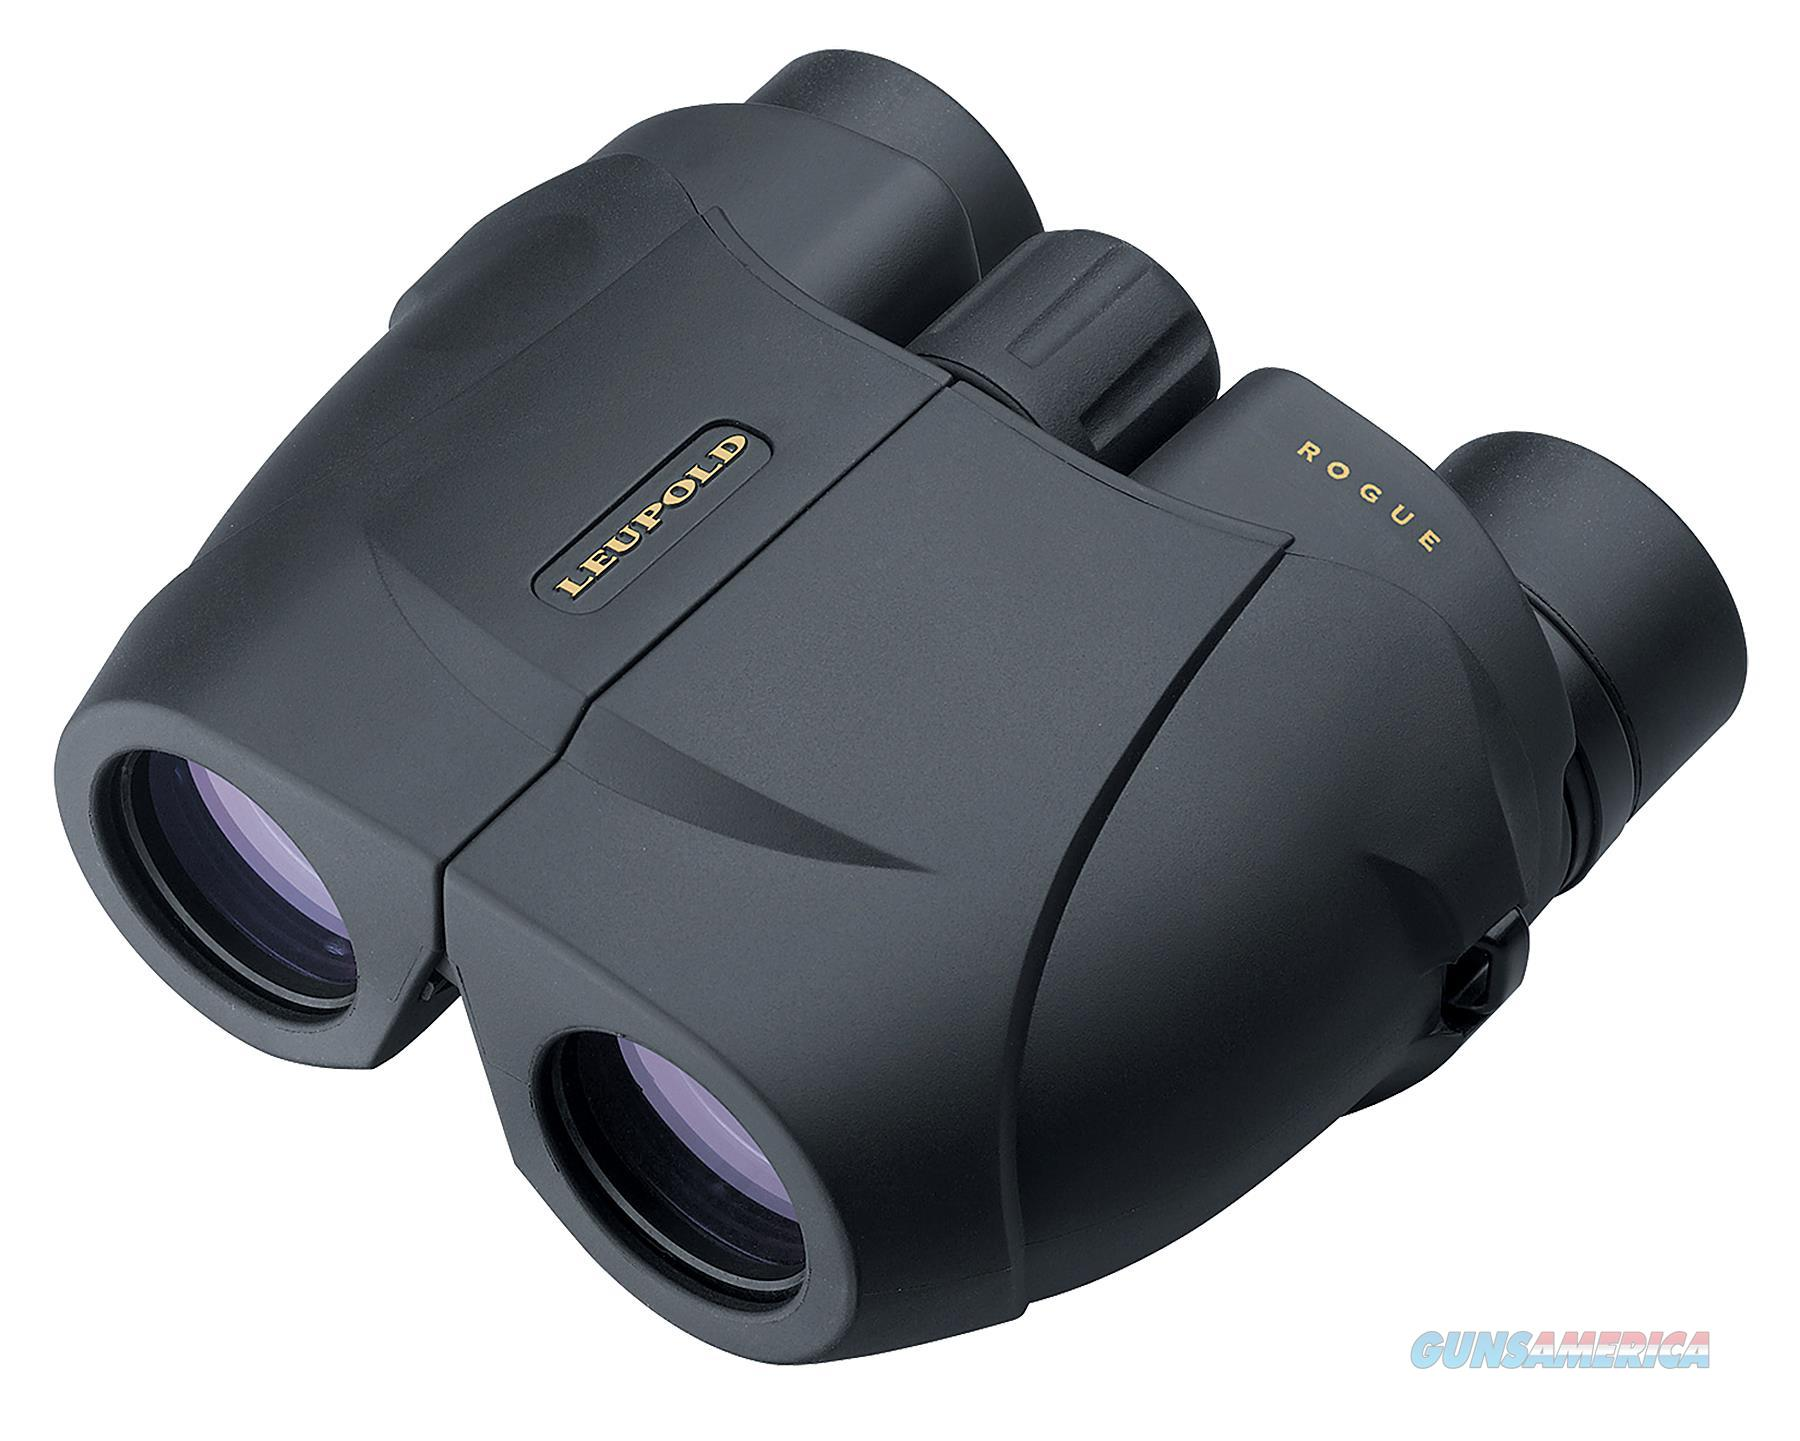 Leupold 59225 Bx-1 10X 25Mm 294 Ft @ 1000 Yds Fov 15Mm Eye Relief Black 59225  Non-Guns > Scopes/Mounts/Rings & Optics > Non-Scope Optics > Binoculars